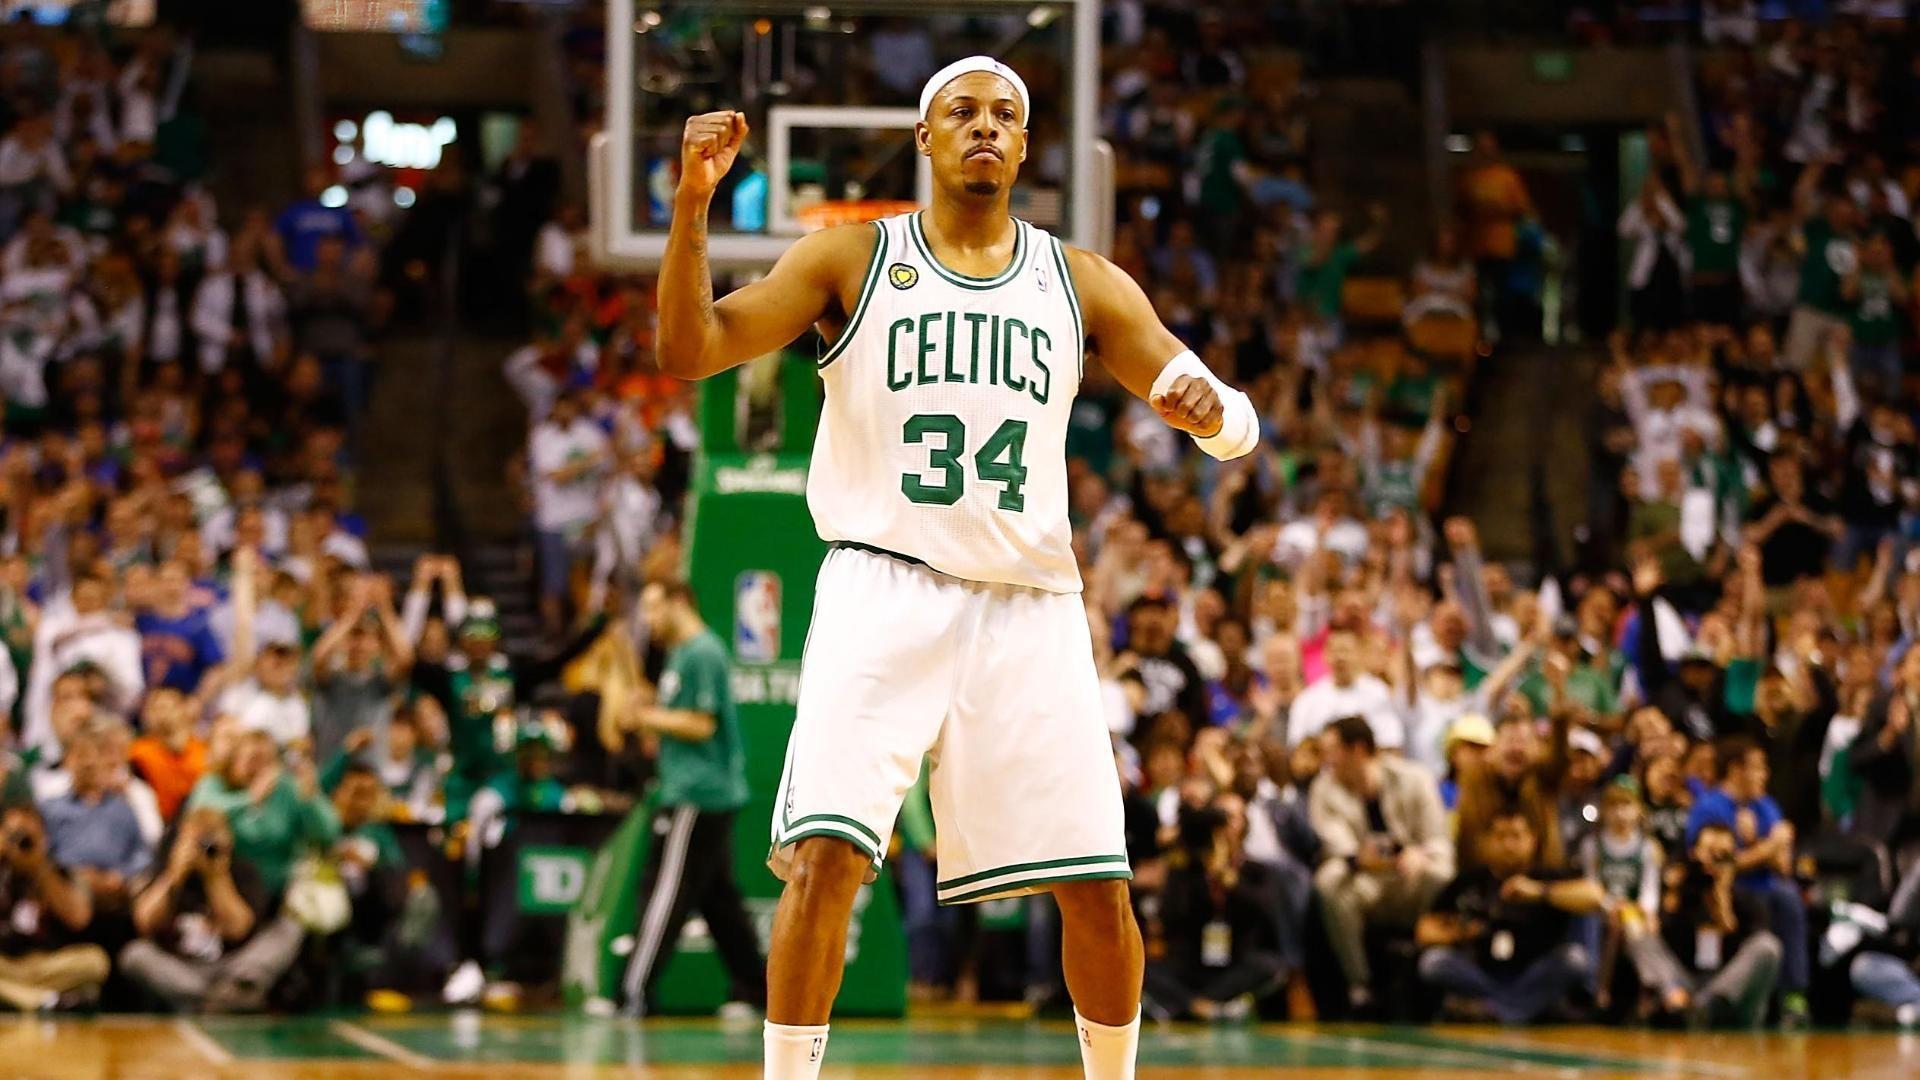 https://secure.espncdn.com/combiner/i?img=/media/motion/2017/0717/dm_170428_NBA_Paul_Pierce_greatest_moments_Celtics1322/dm_170428_NBA_Paul_Pierce_greatest_moments_Celtics1322.jpg